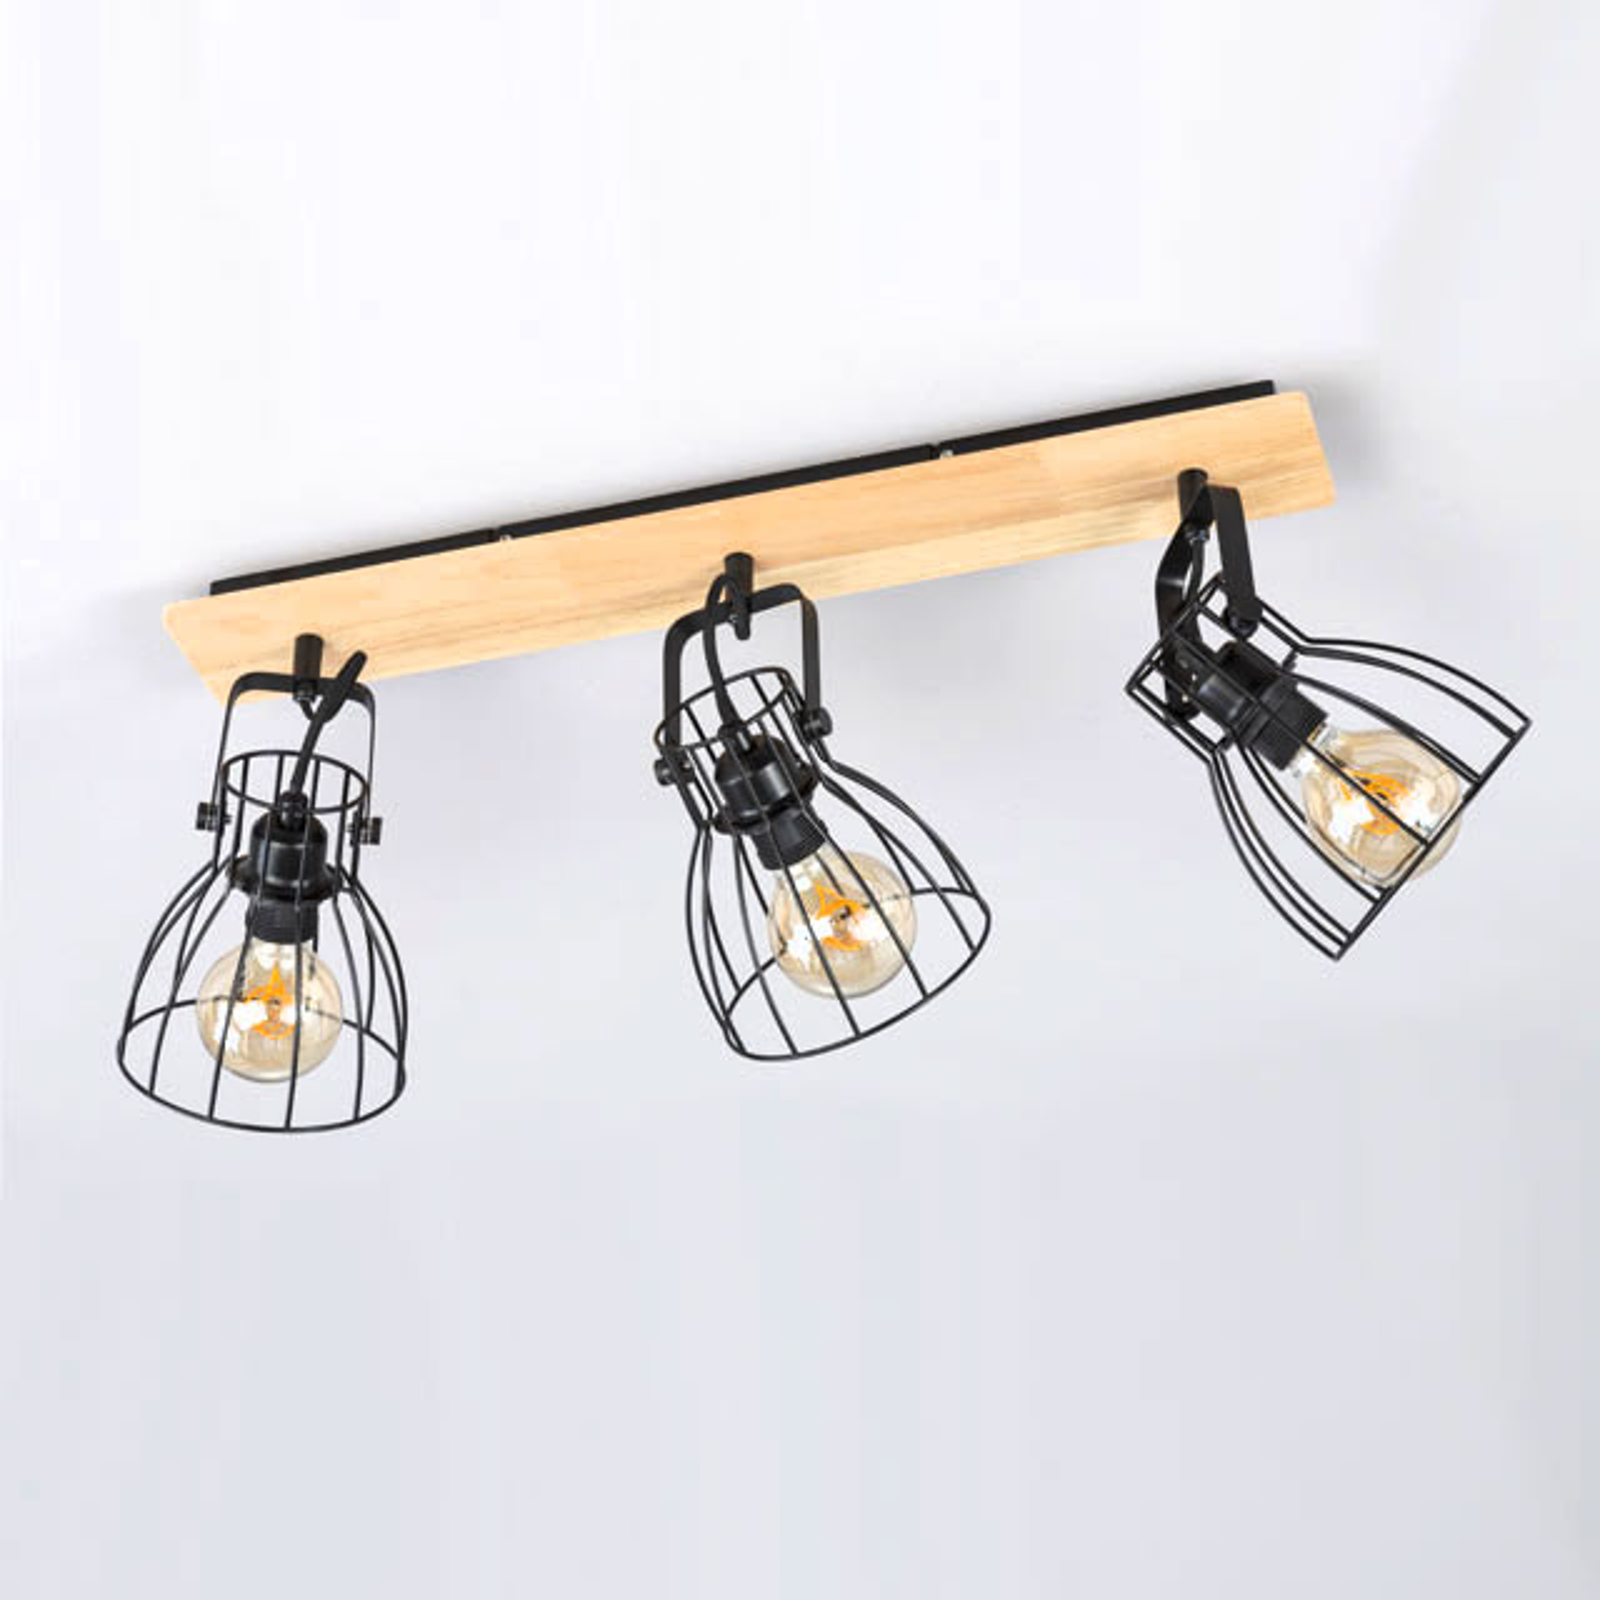 Plafondlamp Die in houtoptiek met 3 kooikappen